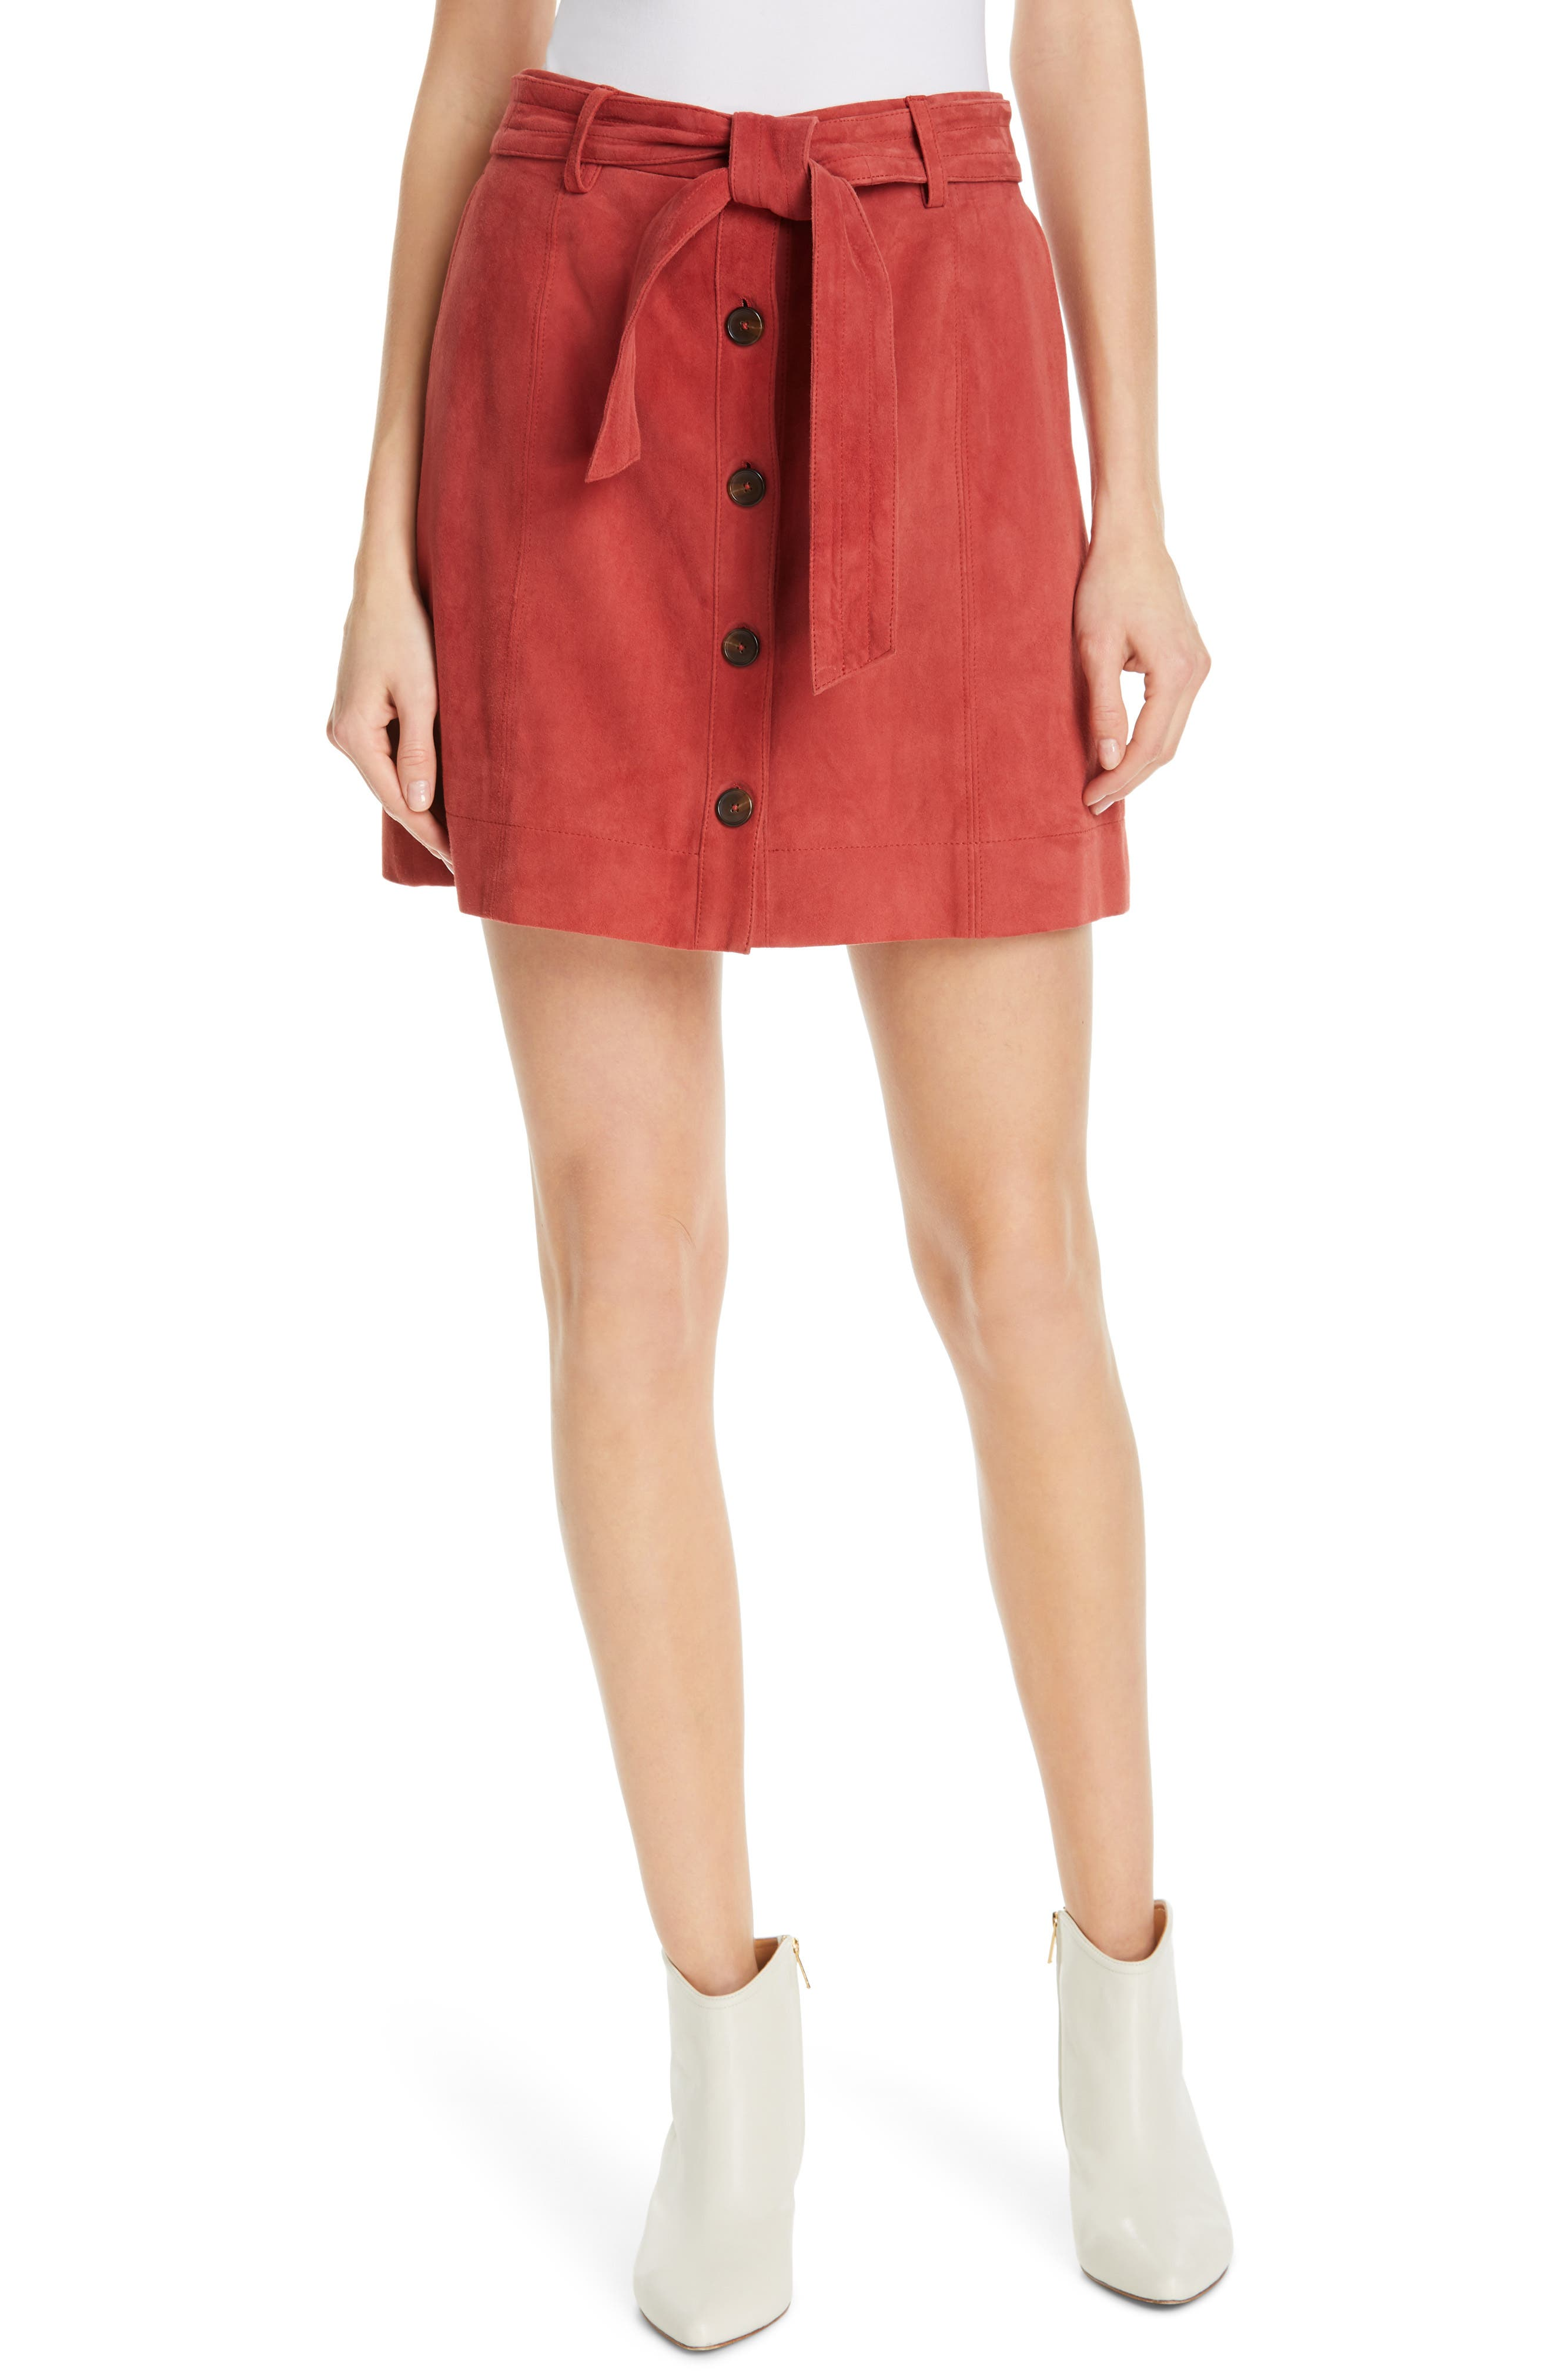 JOIE Neida Suede Miniskirt, Main, color, DESERT SPICE